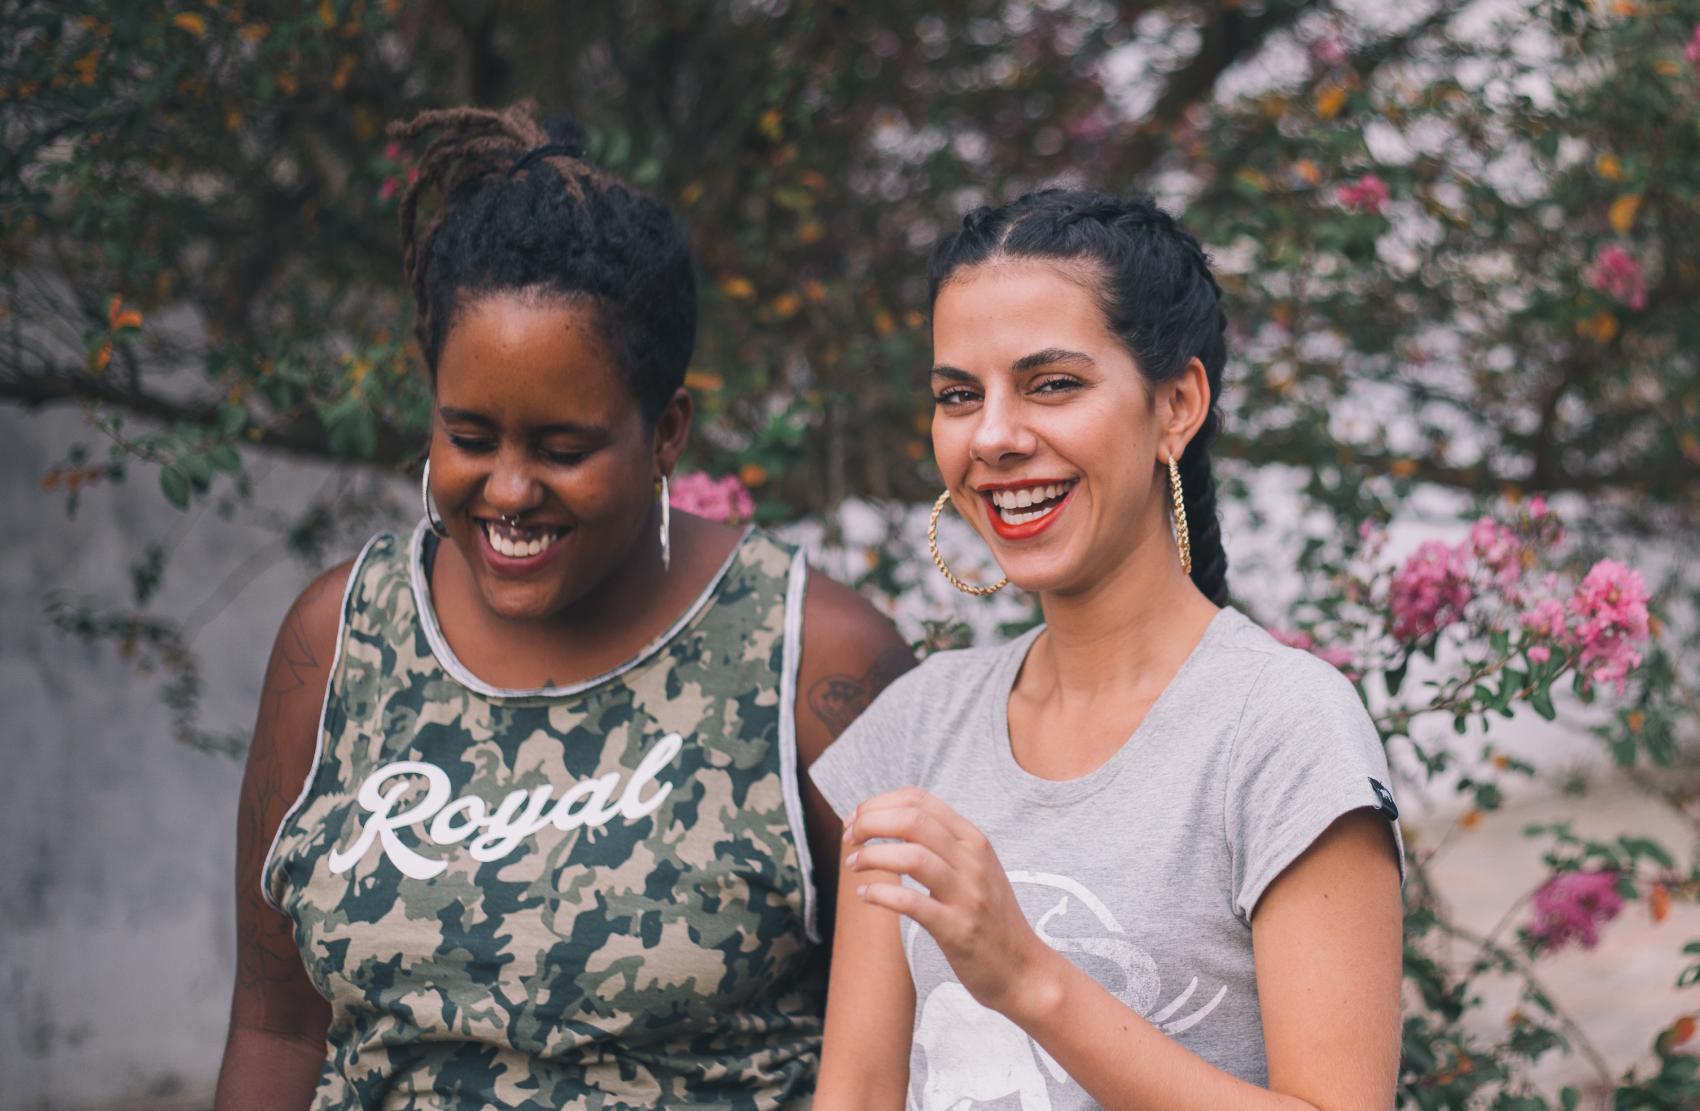 Two smiling women with catamenial epilepsy